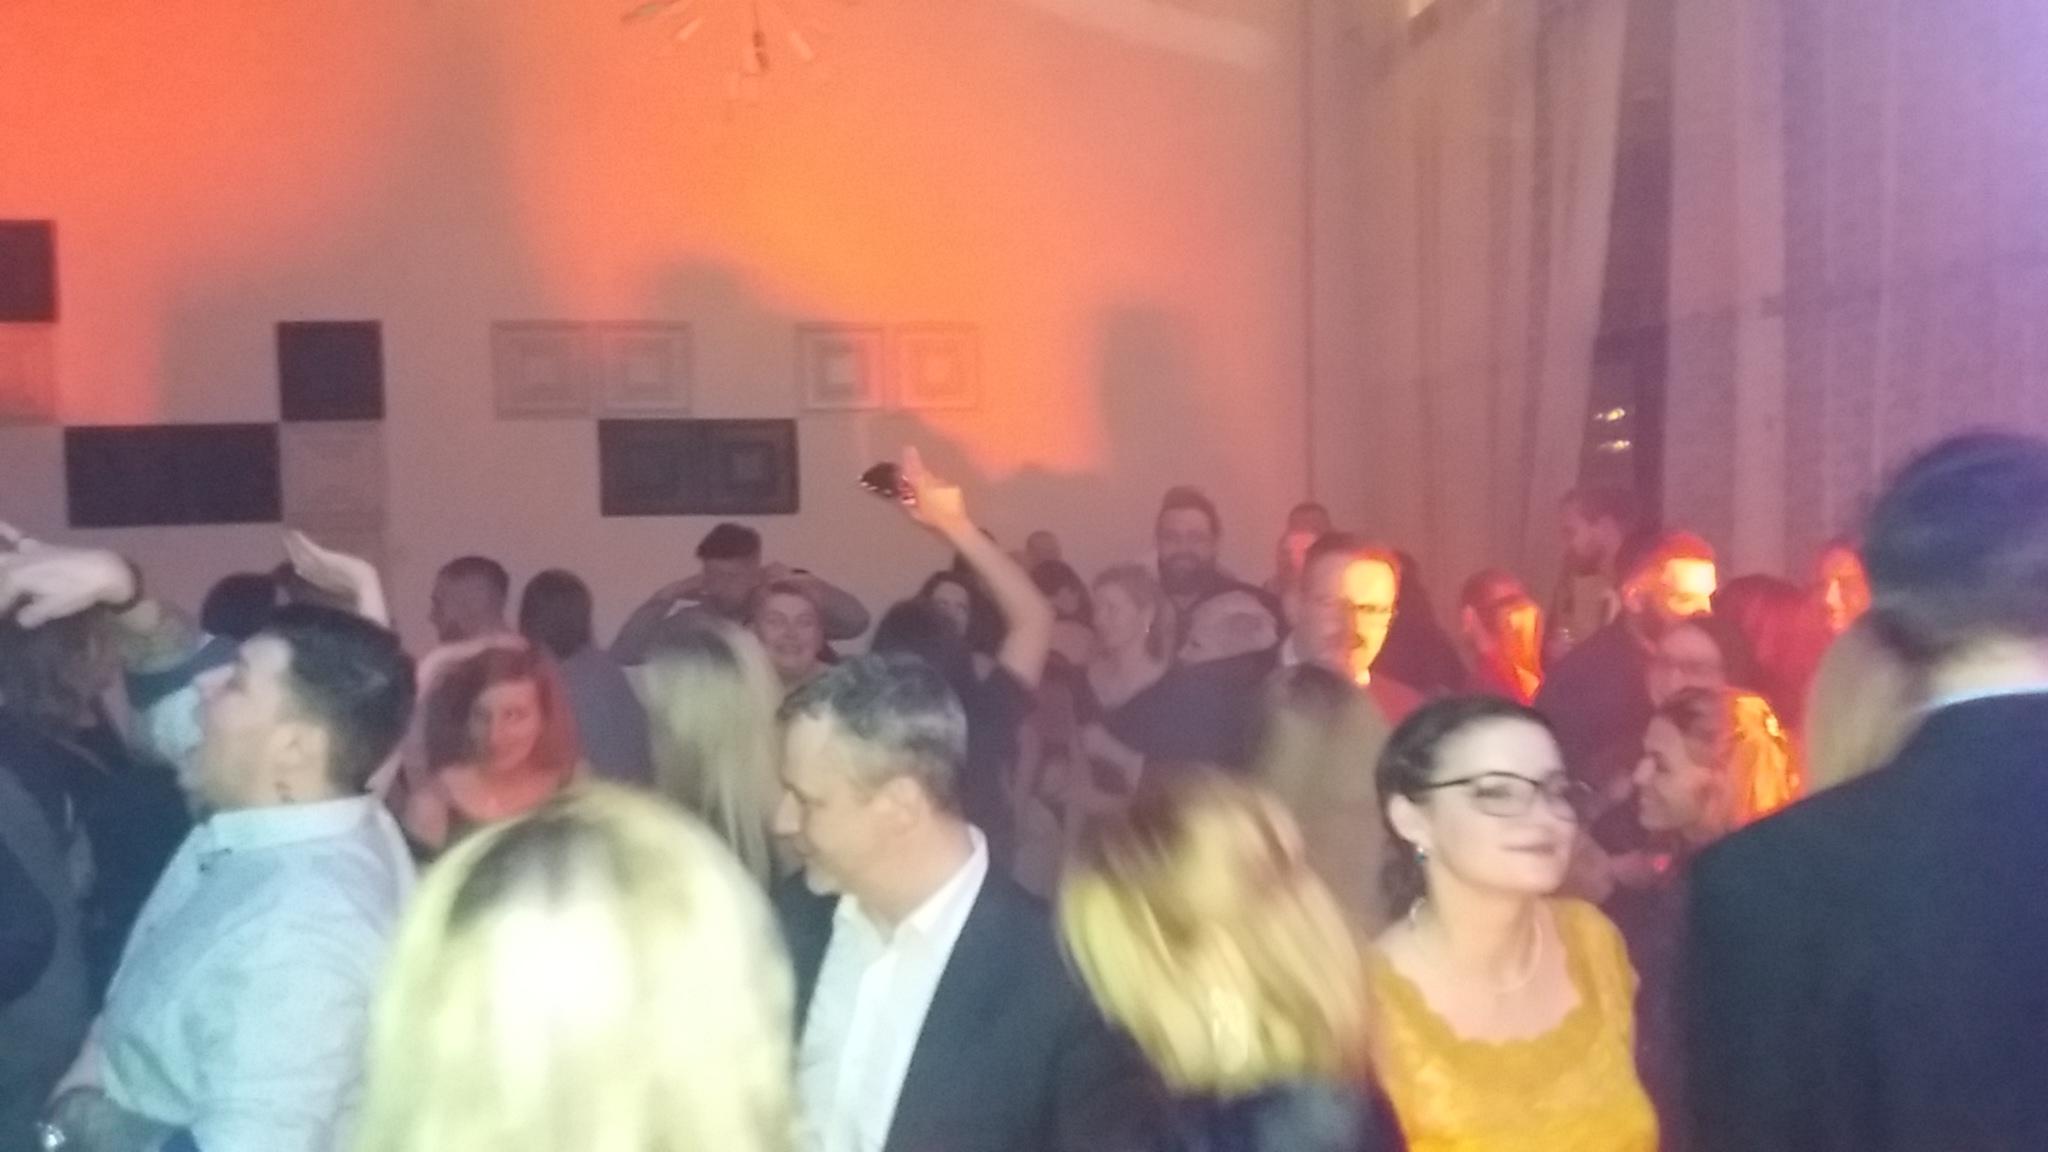 Neratovice Filmový ples  atmosféra 14.2.2020.jpg